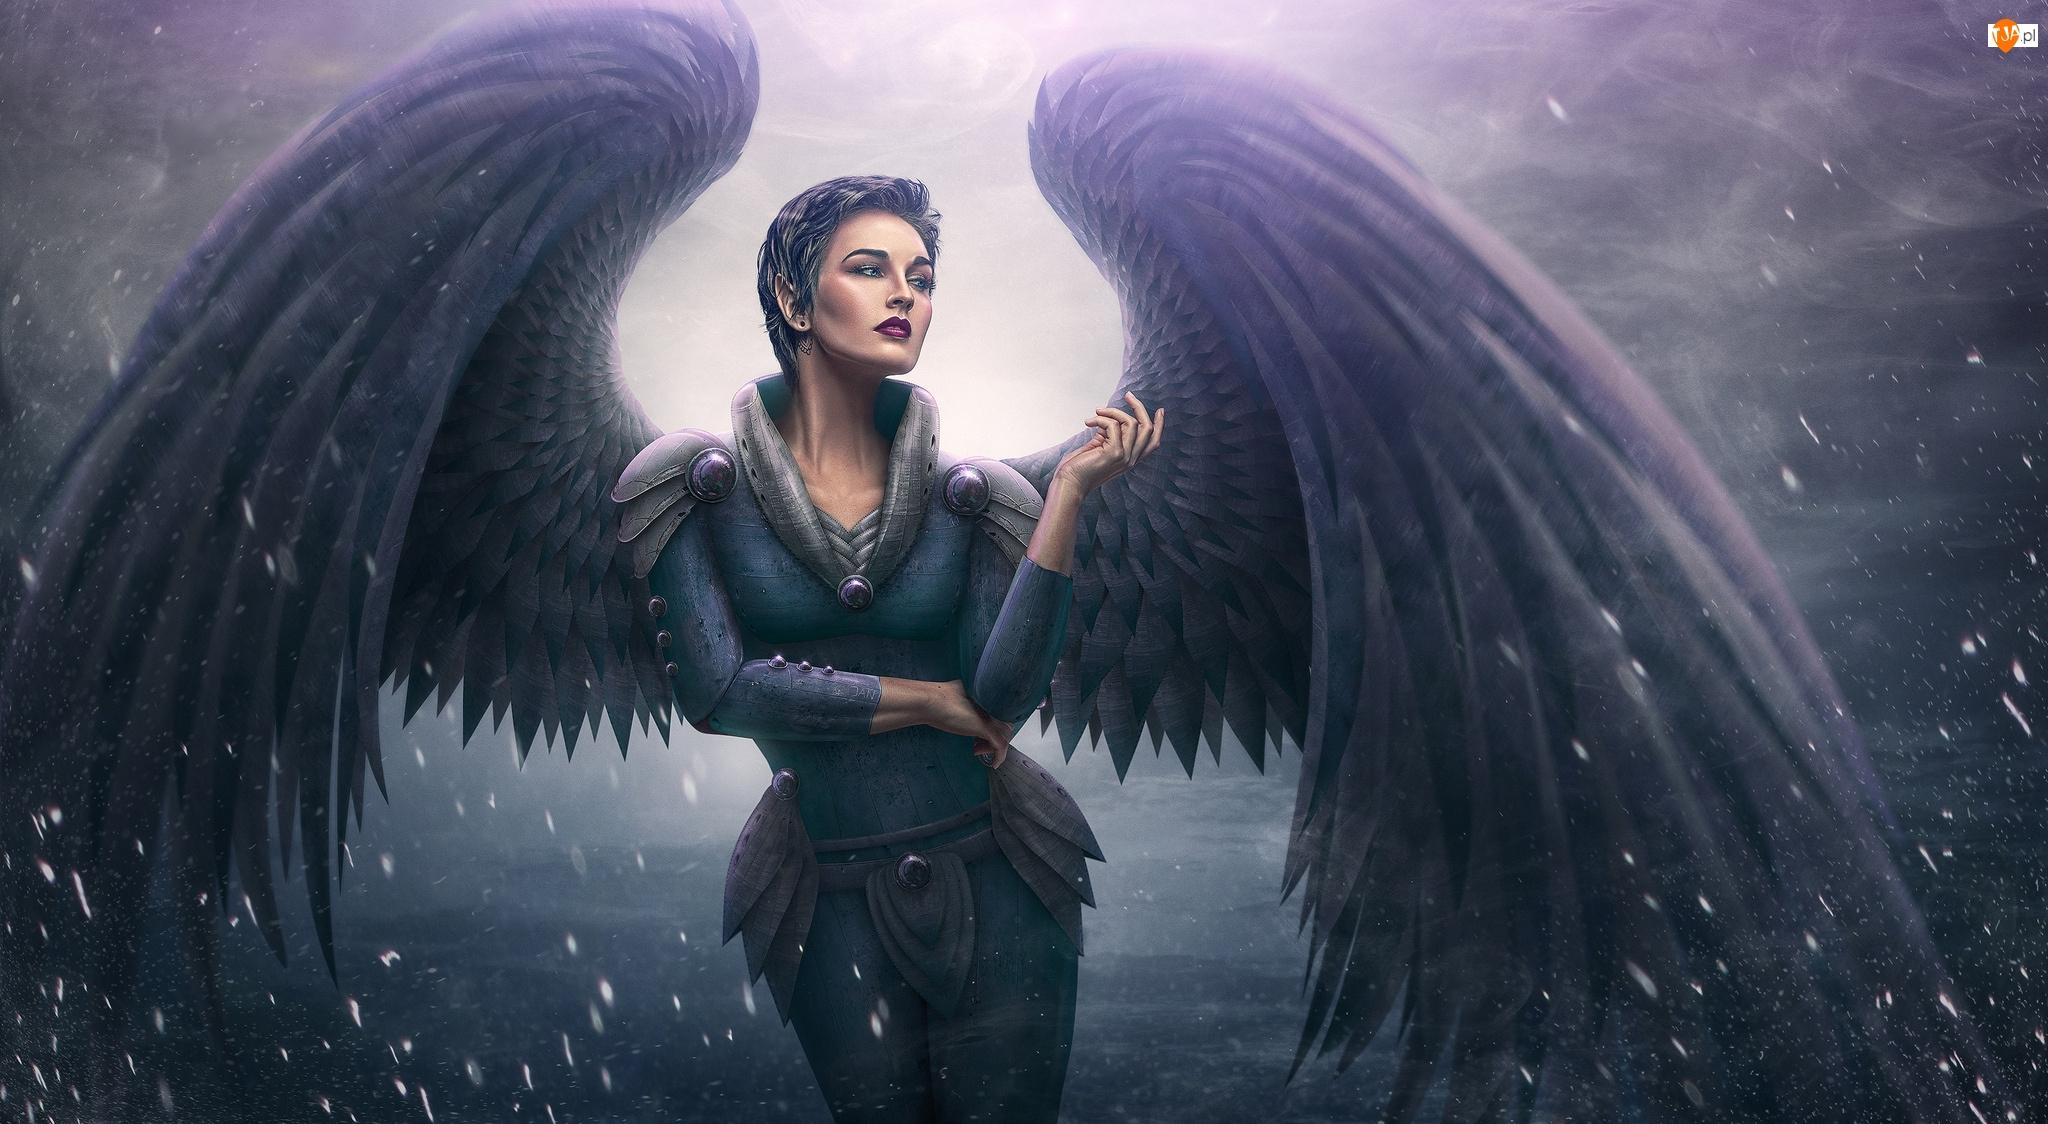 Anioł, Fantasy, Kobieta